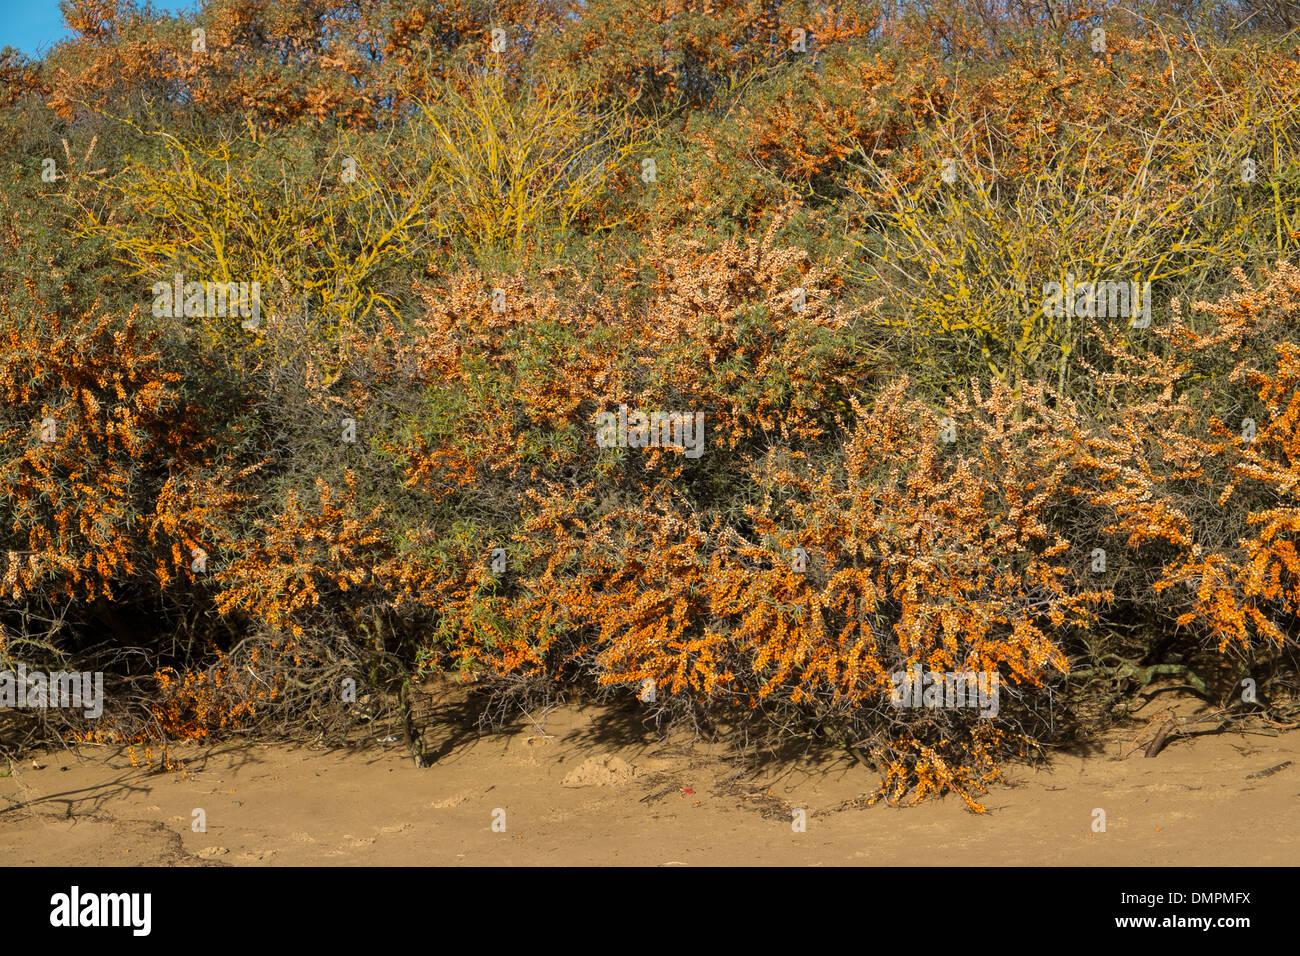 Dunas costeras cubiertas de matorrales de espino cerval de mar, (Hippophae) mostrando bayas maduras. Foto de stock